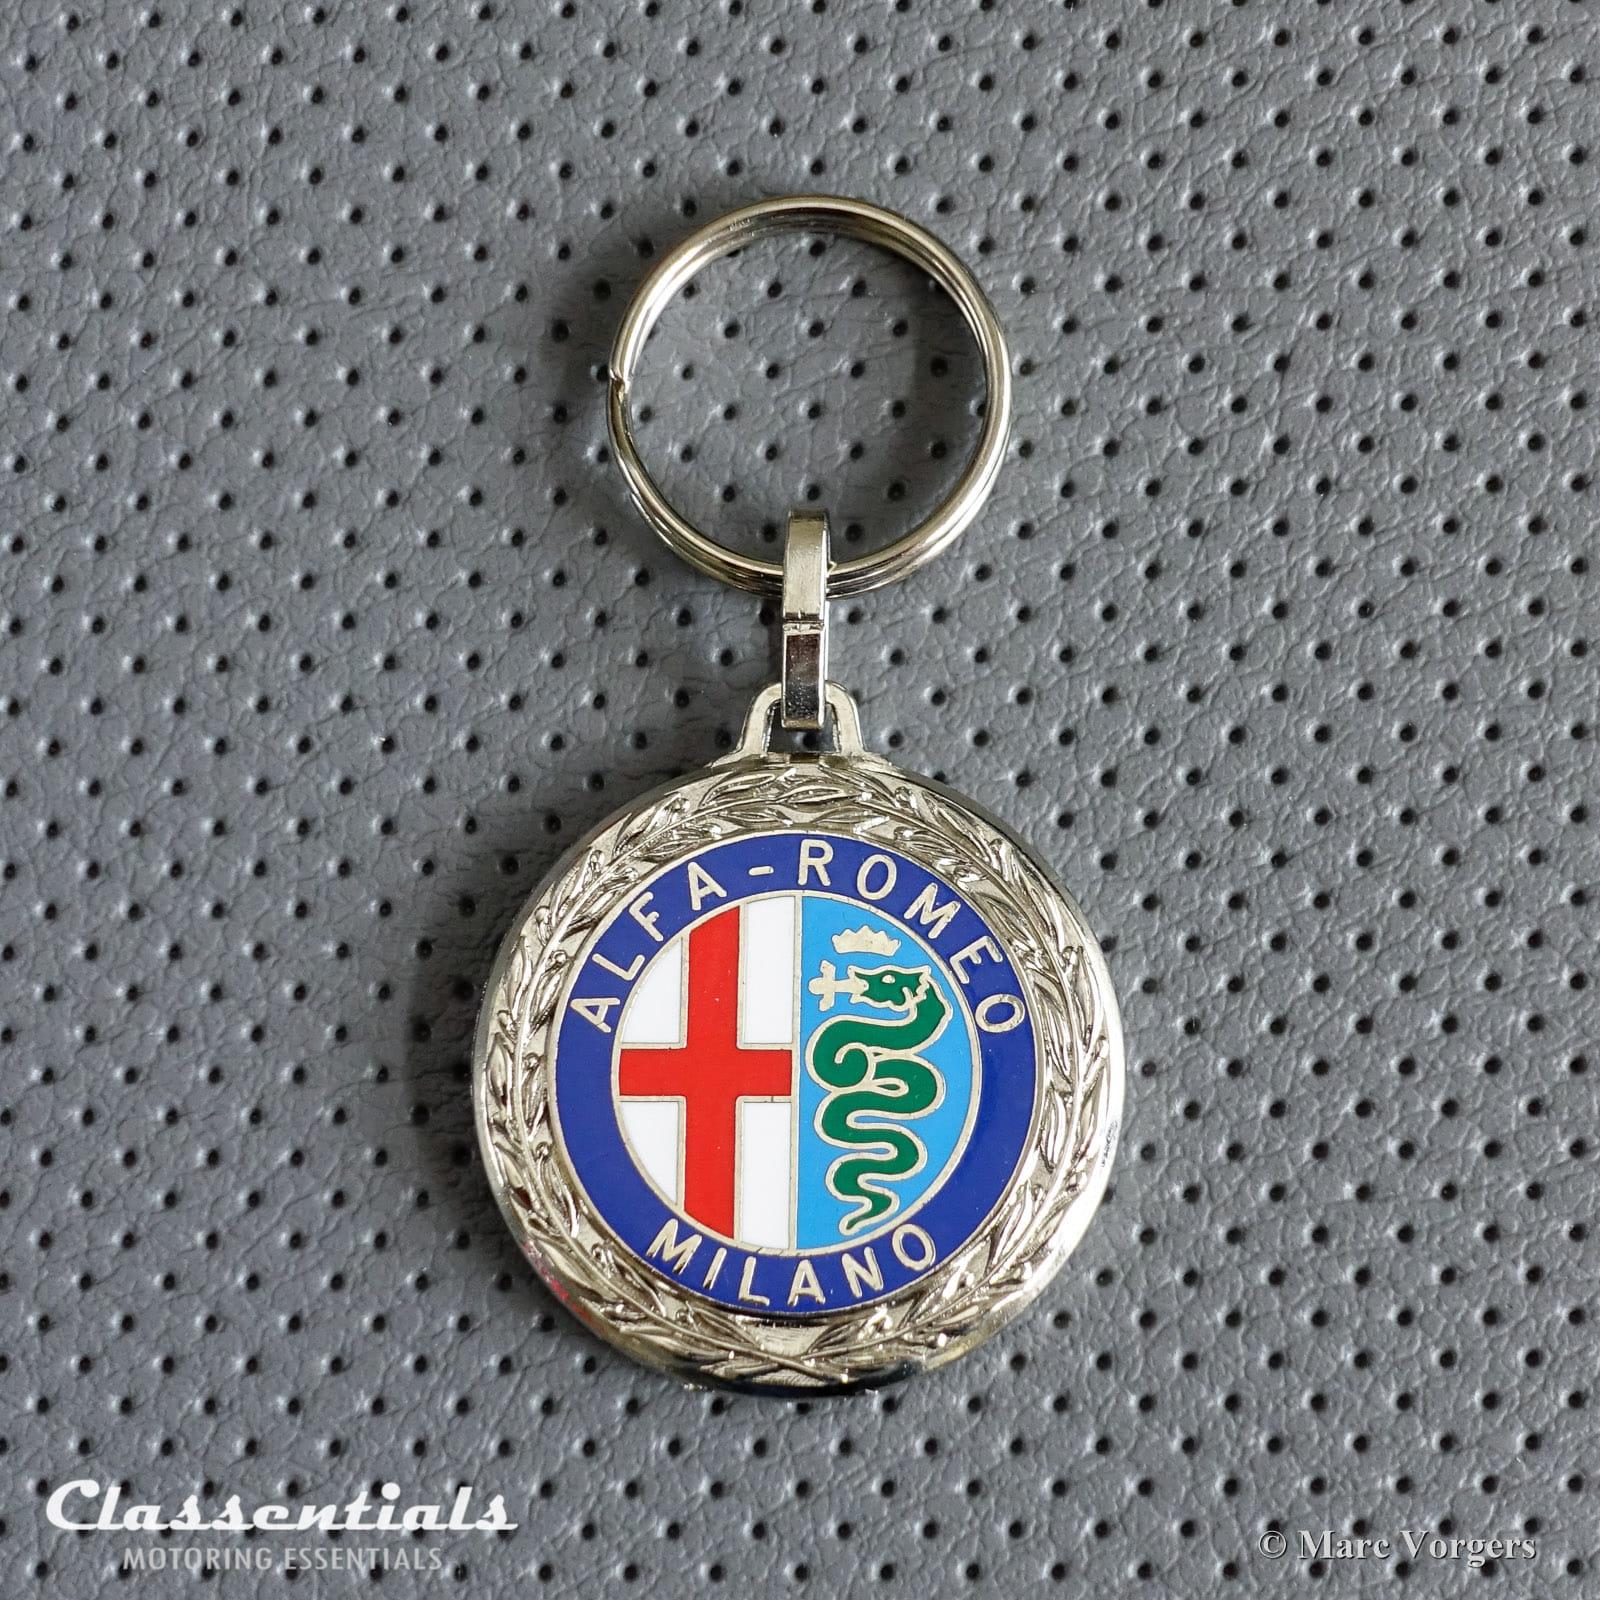 New Metal Chrome Alfa Romeo Key Ring Fob Models Up To 1973